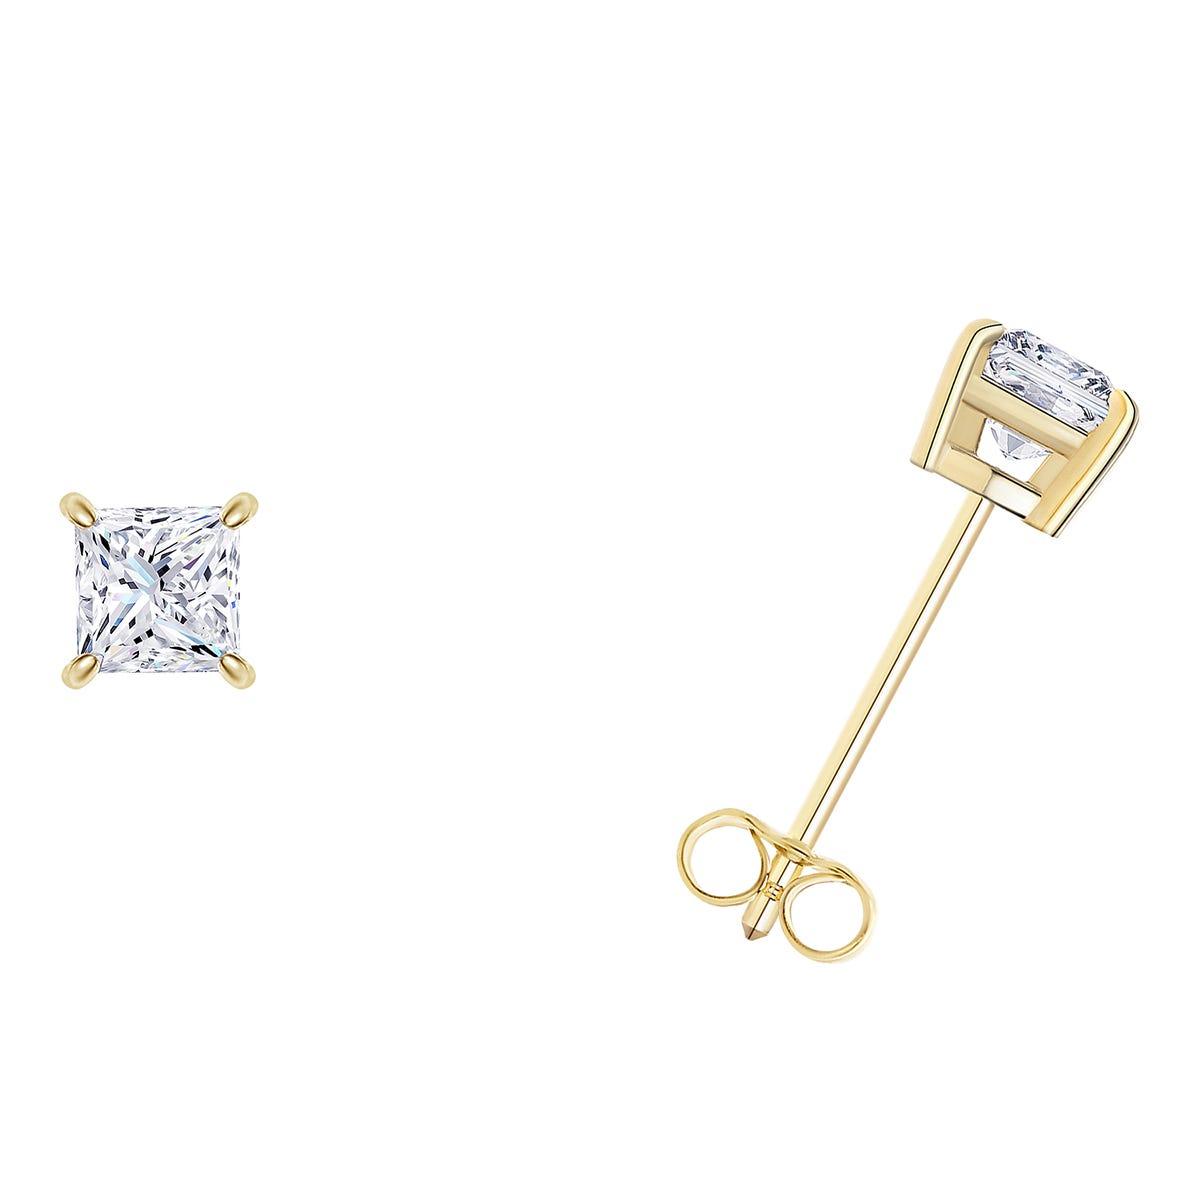 1/5 CTTW Princess Cut Diamond Solitaire Stud Earrings in 10K Yellow Gold IGI Certified